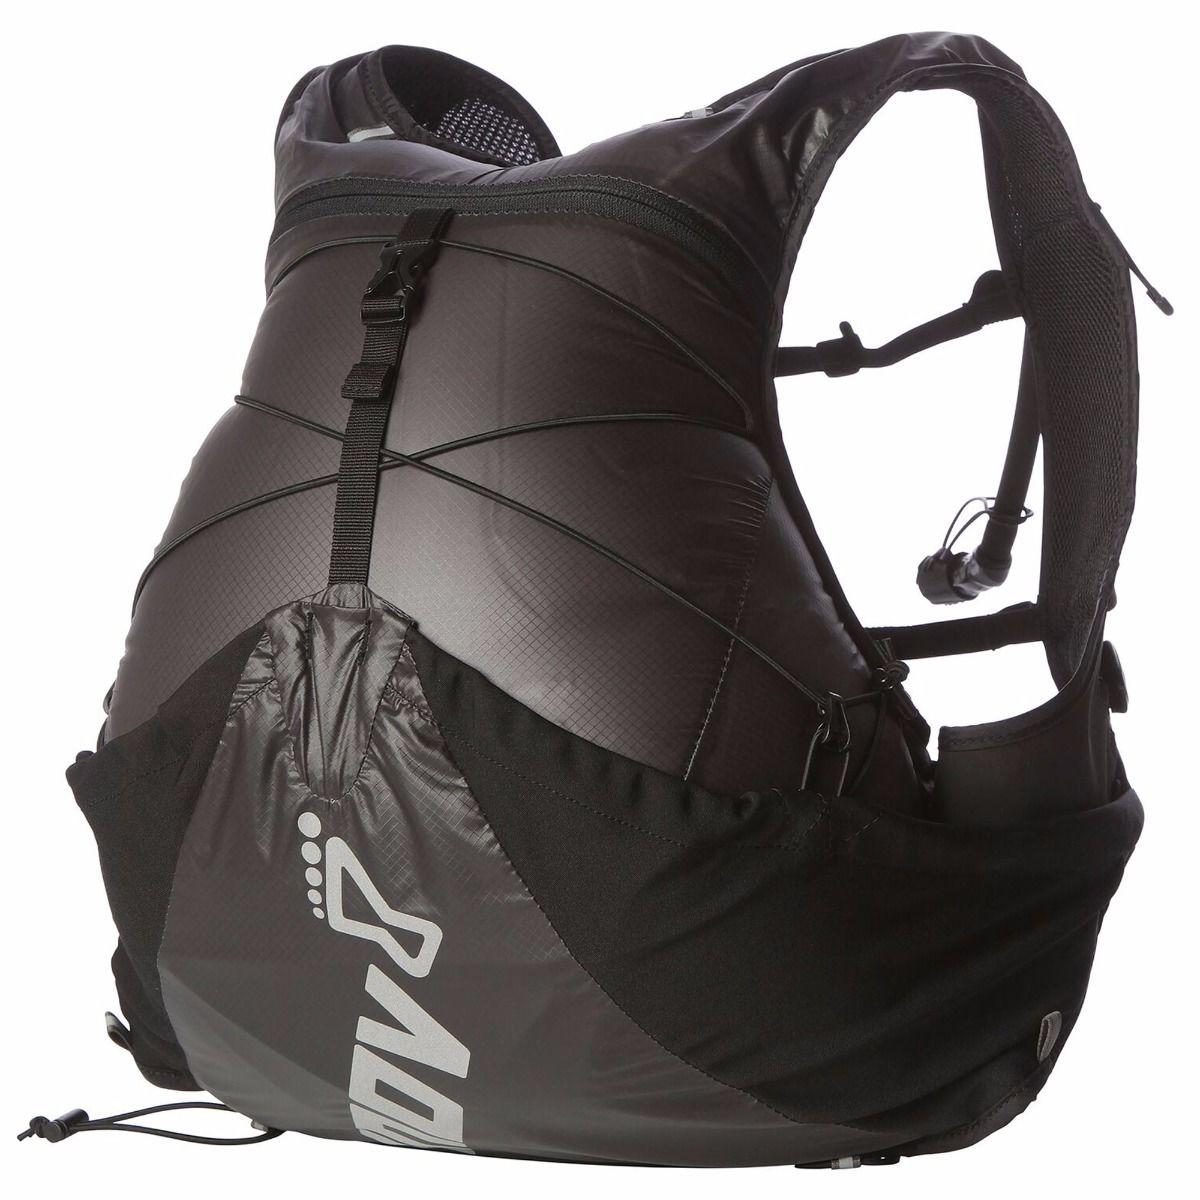 c378c443c86 Road Trail Run: Inov-8 Race Ultra 10 BOA Hydration Vest Review